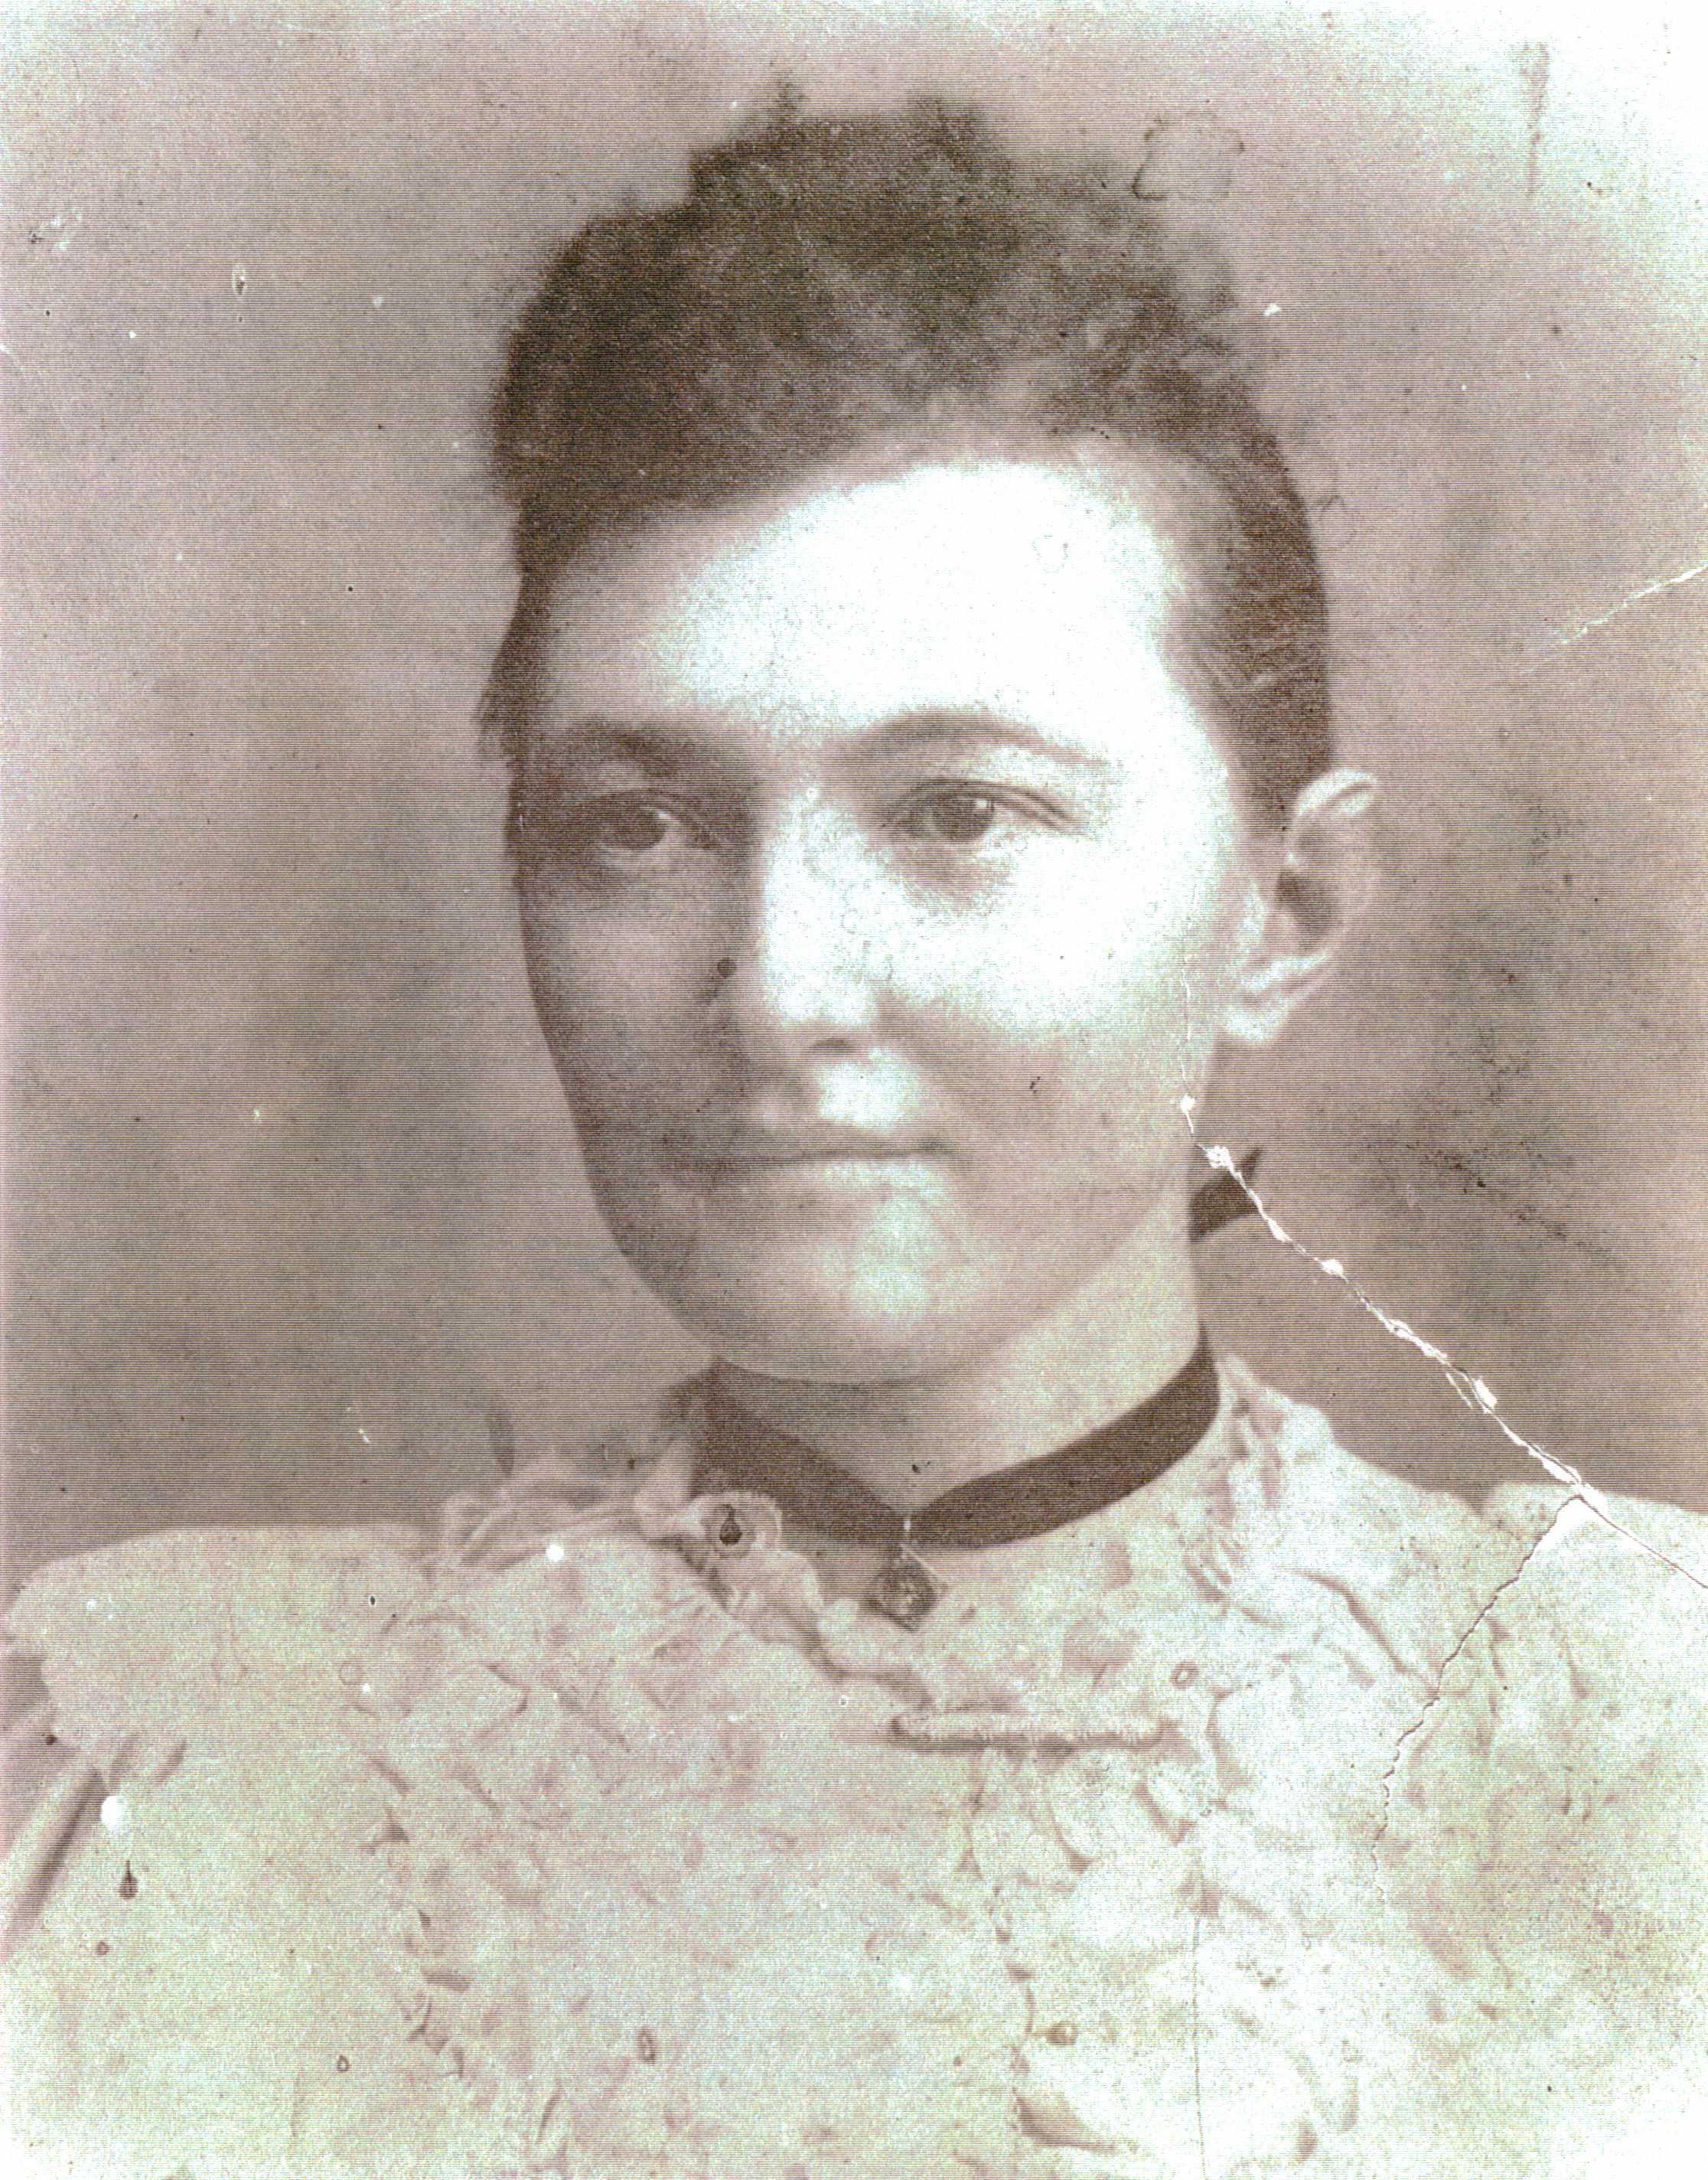 Sarah Theresa McCorriston, 1868-1924